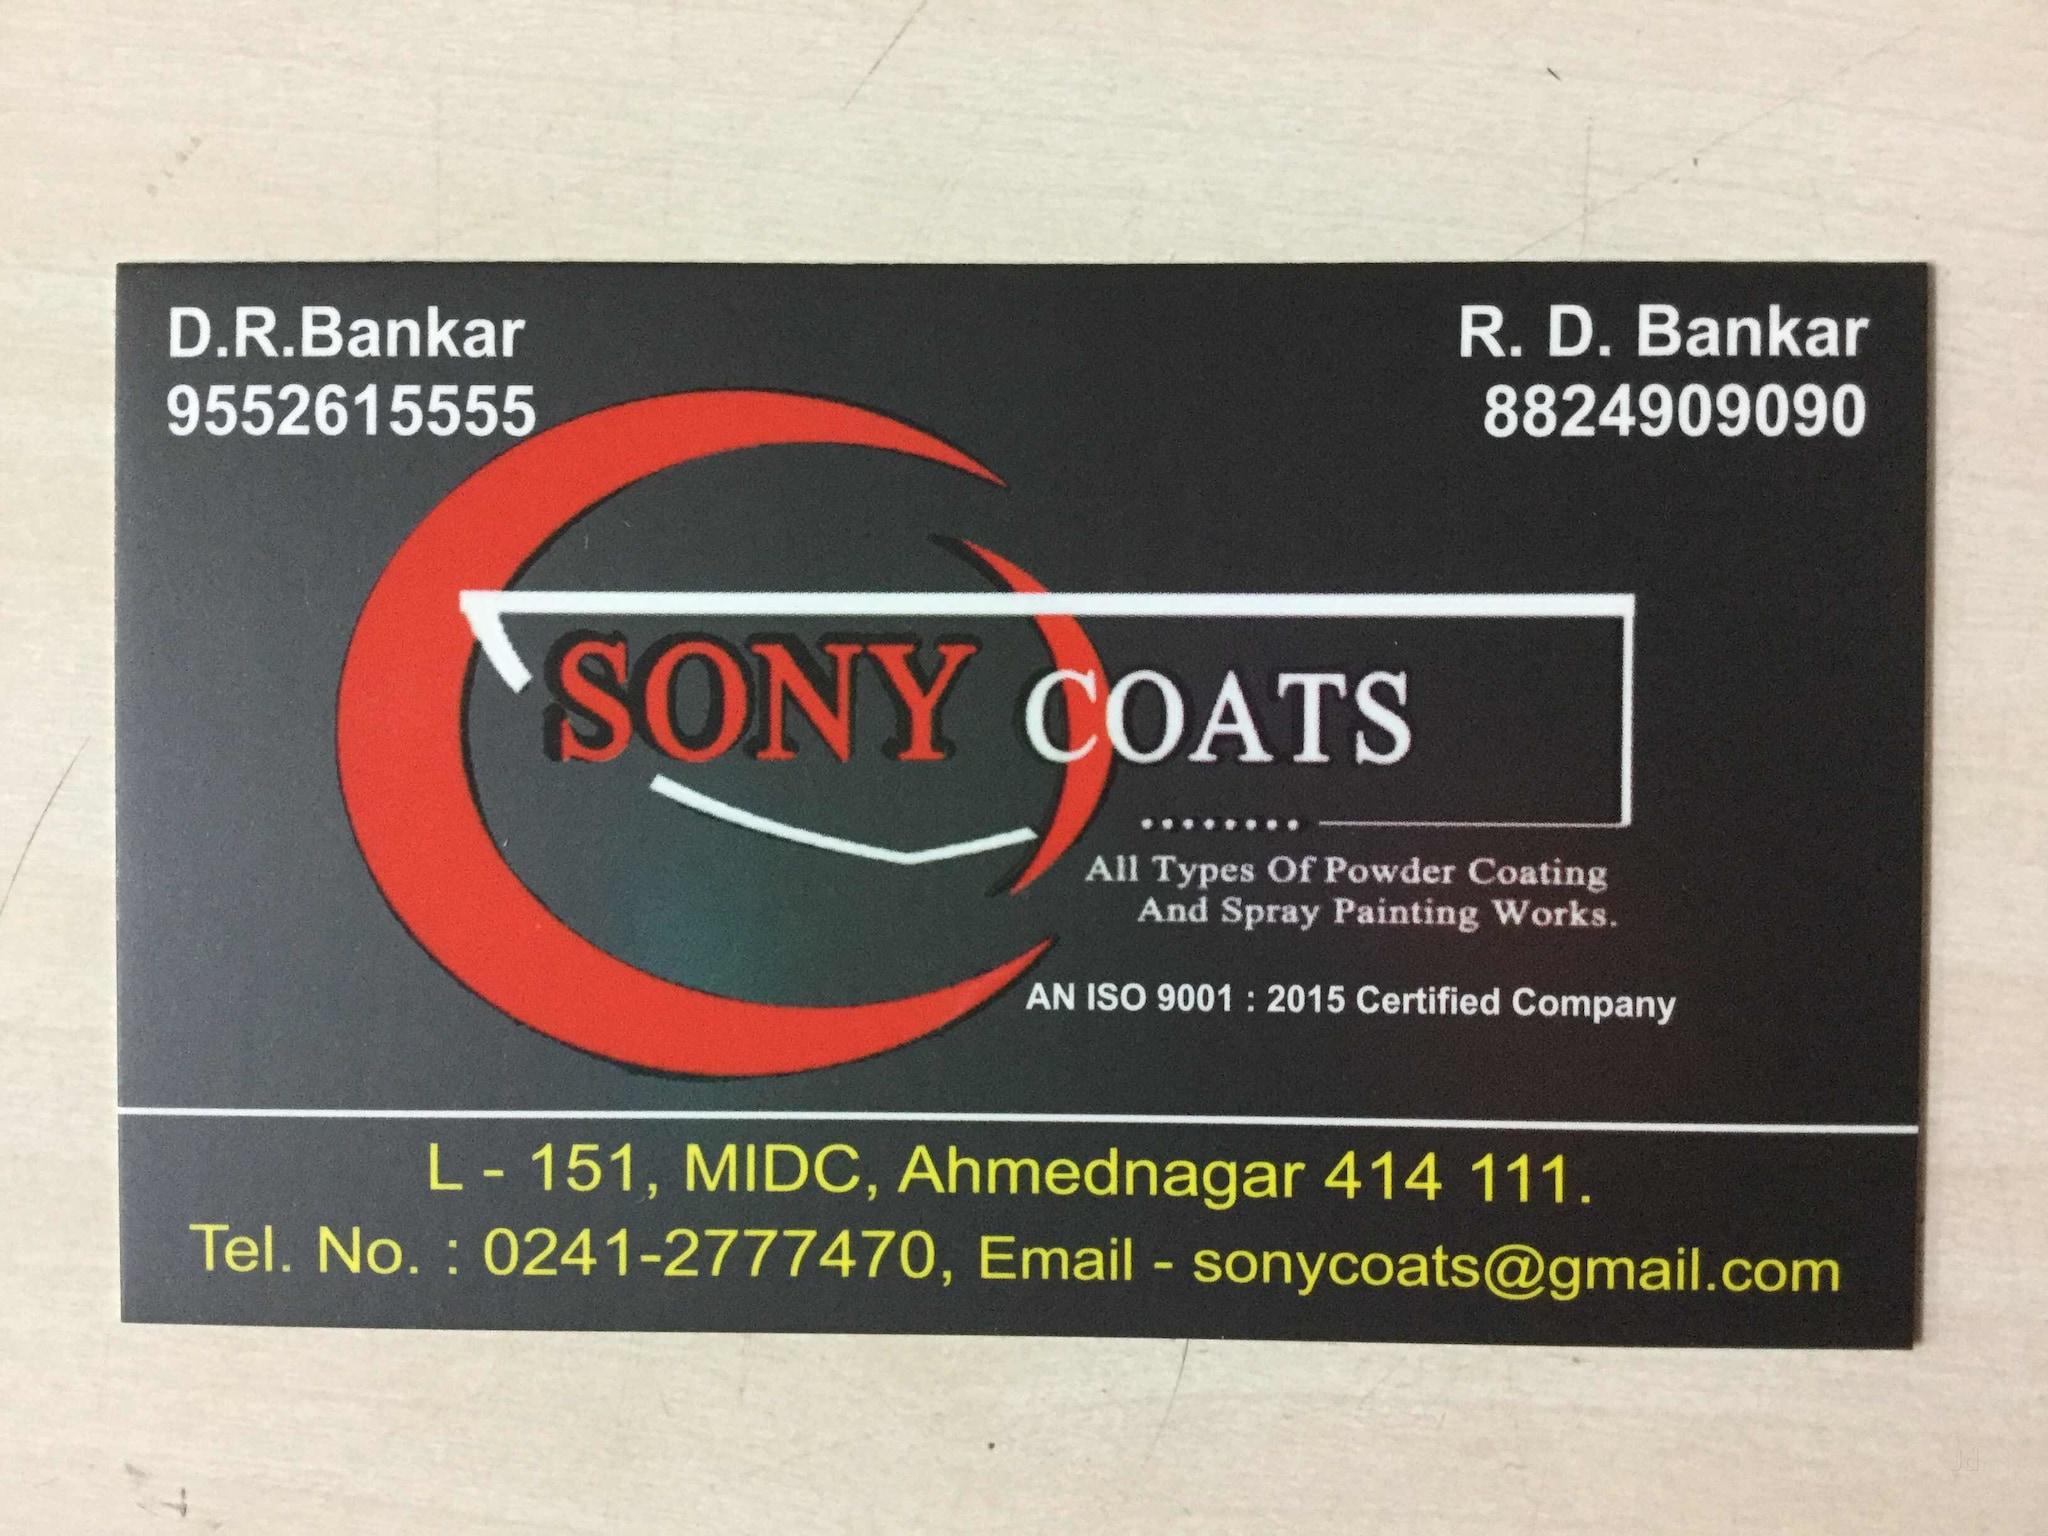 Sony Coats, Ahmednagar MIDC - Powder Coating Services in ...